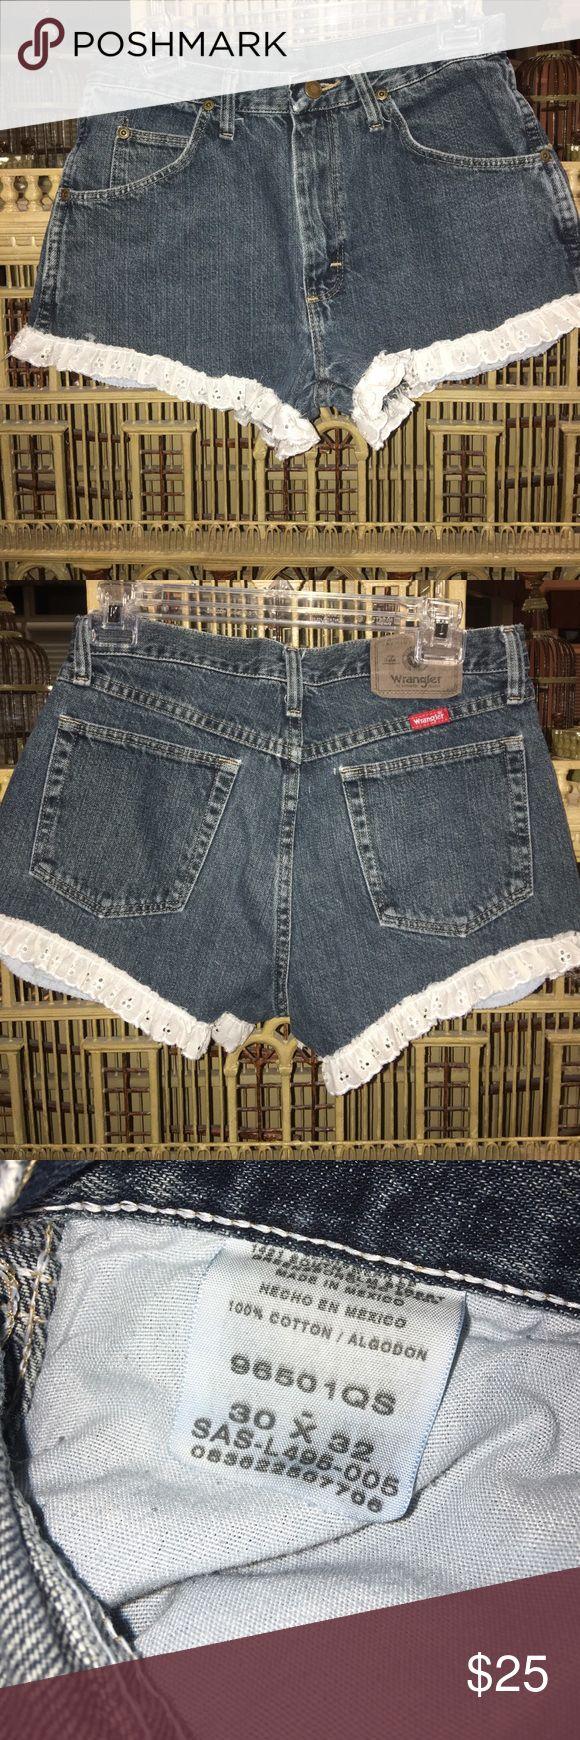 "🎀🎀🎀🌸🌸🌸Wrangler Eyelet Shorts 30"" waist🌸🌸🌸 🌸🌸🌸Lovely Wrangler Shorts 30"" Waist⛵️⛵️⛵️My daughter was a Sz 2 when she wore these🎀🎀🎀 Wrangler Shorts Jean Shorts"